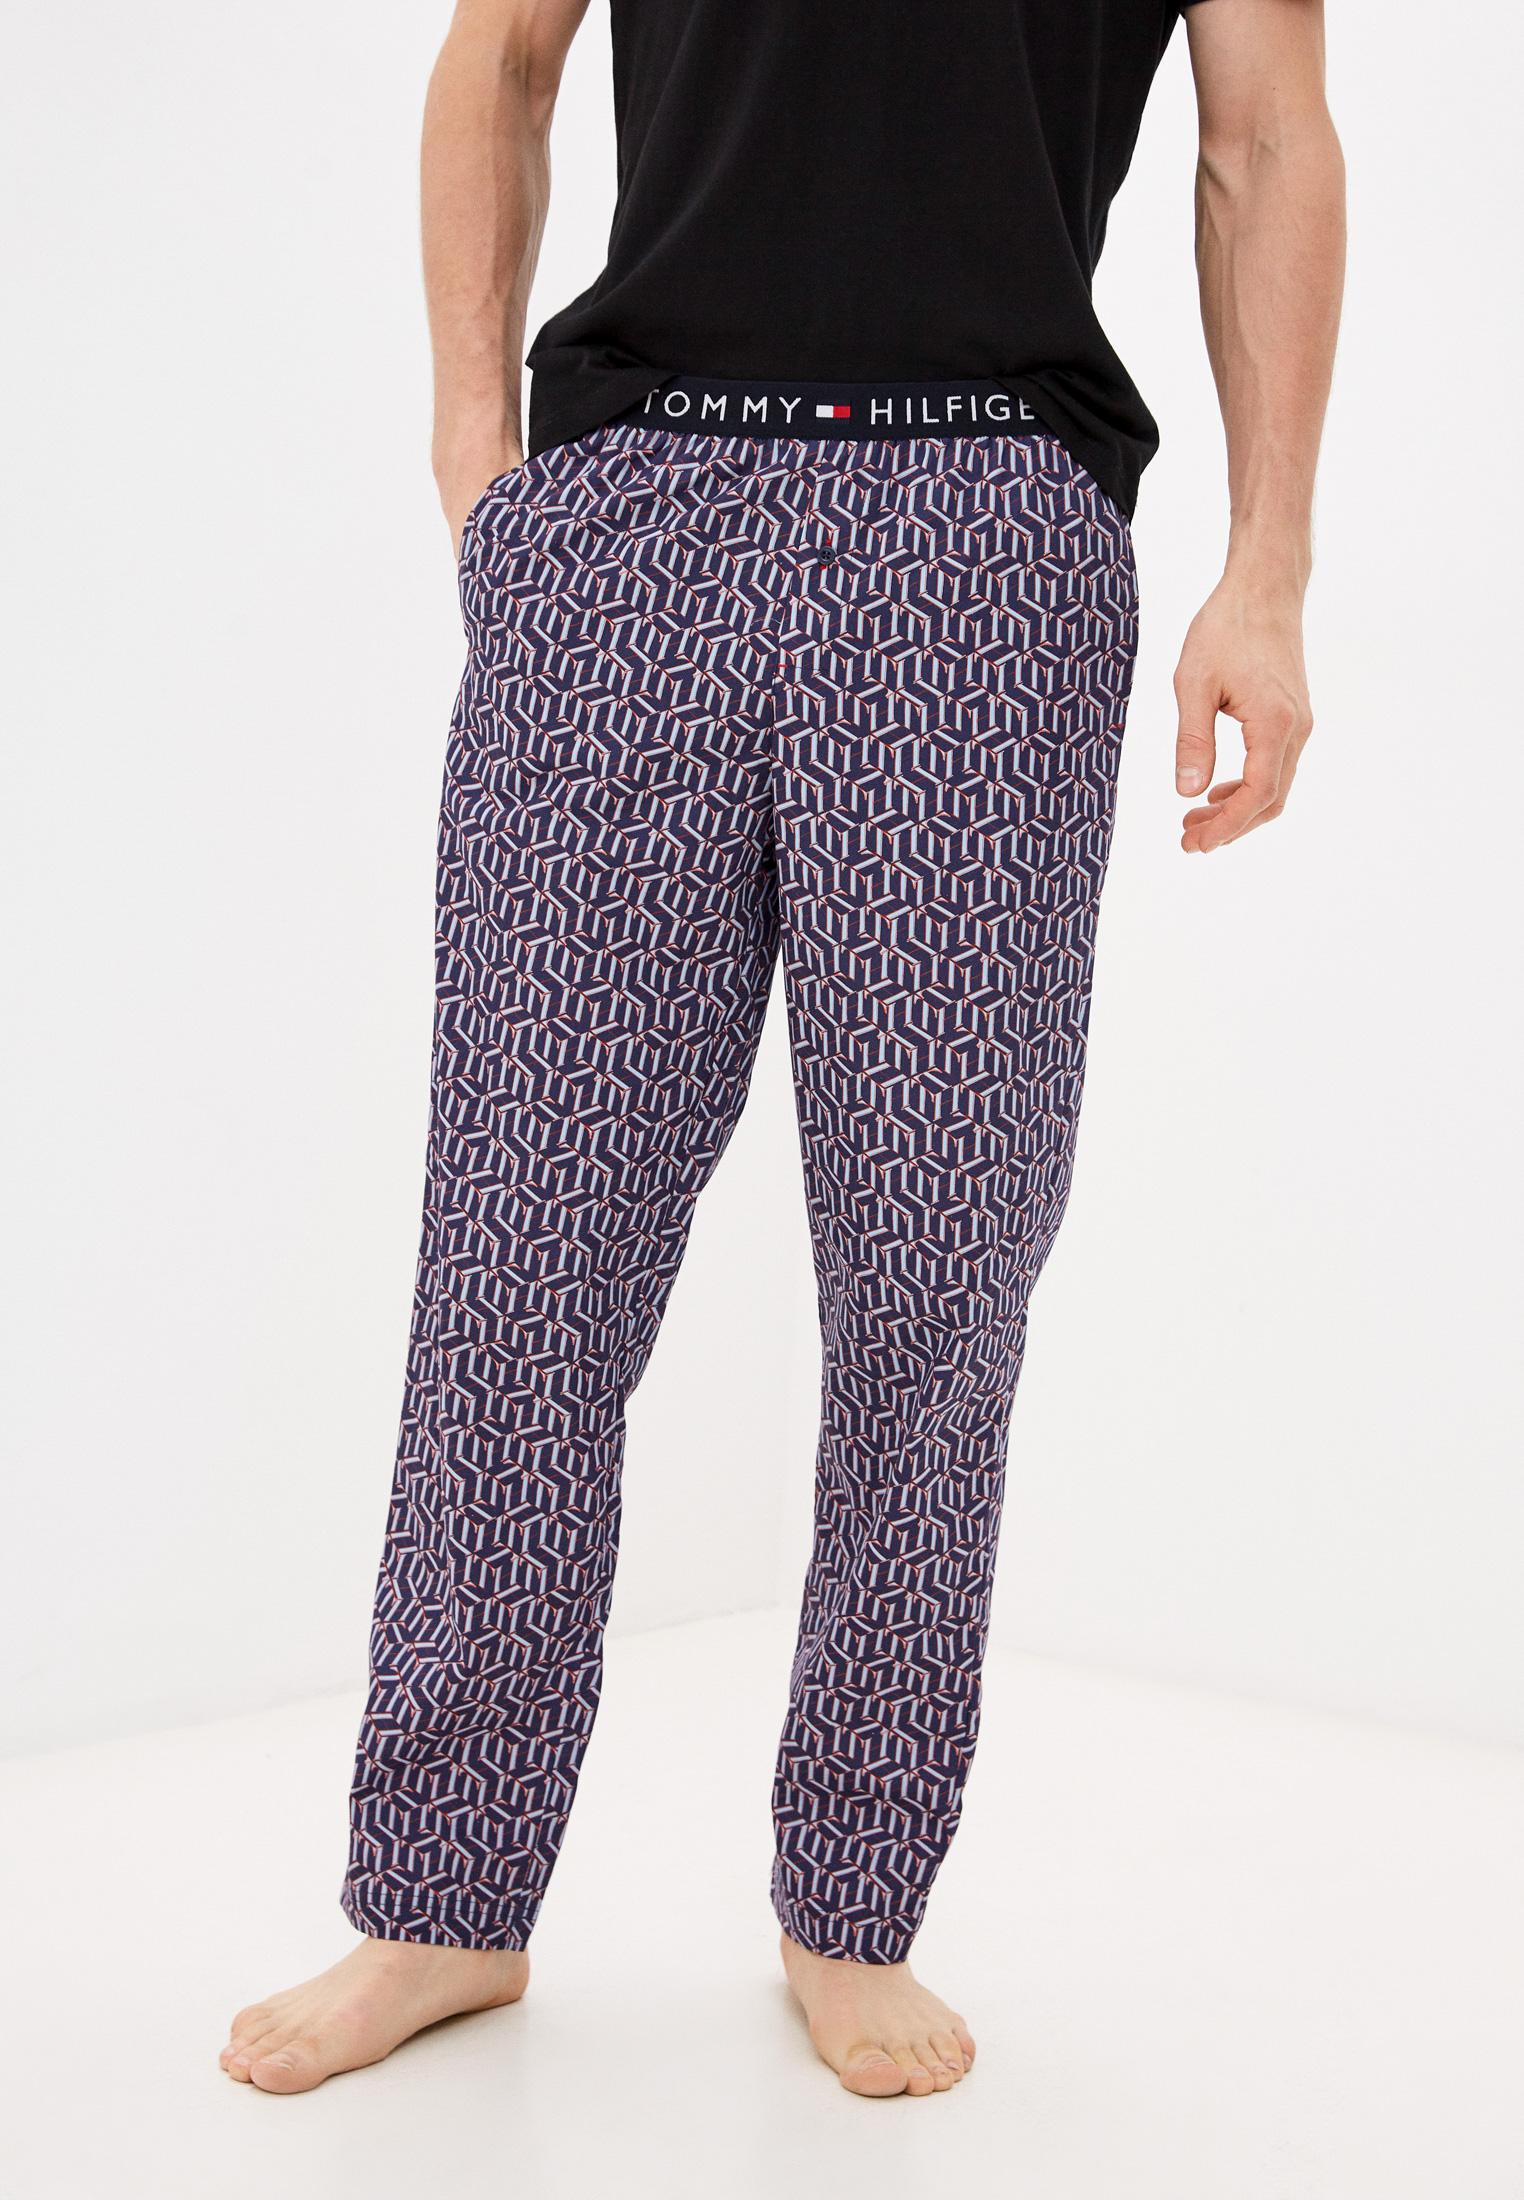 Мужские домашние брюки Tommy Hilfiger (Томми Хилфигер) Брюки домашние Tommy Hilfiger